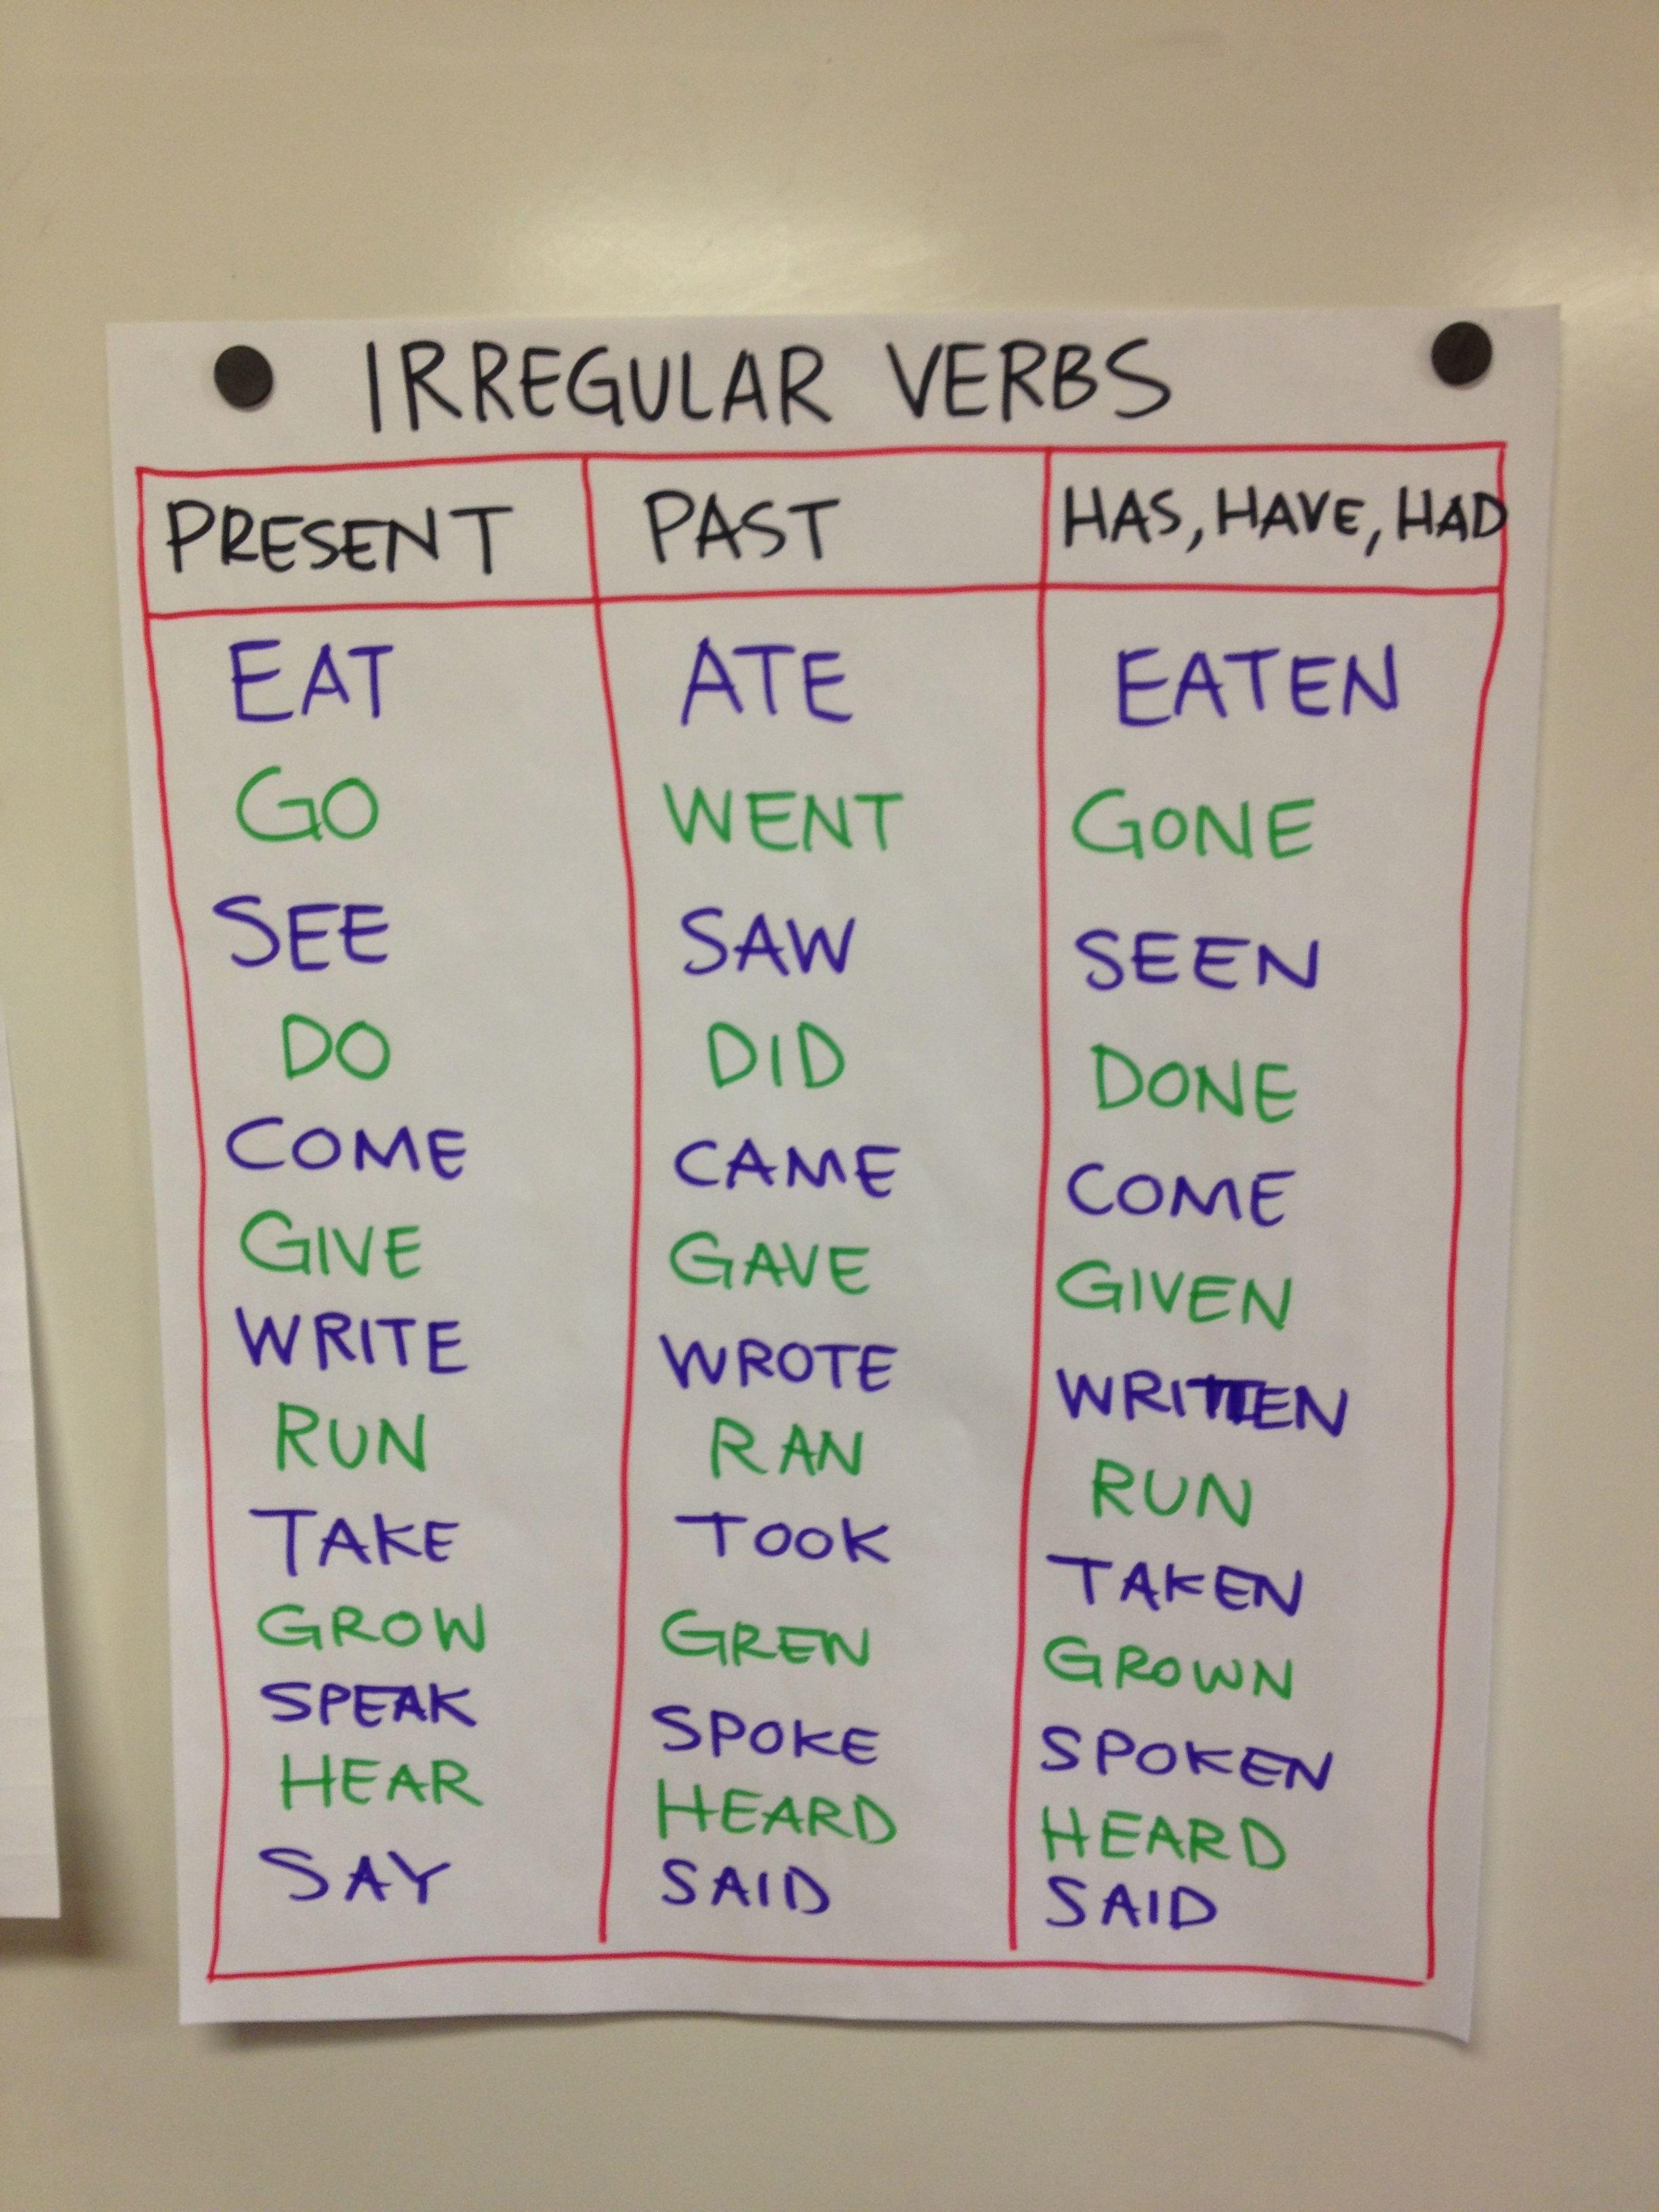 Some Irregular Verbs